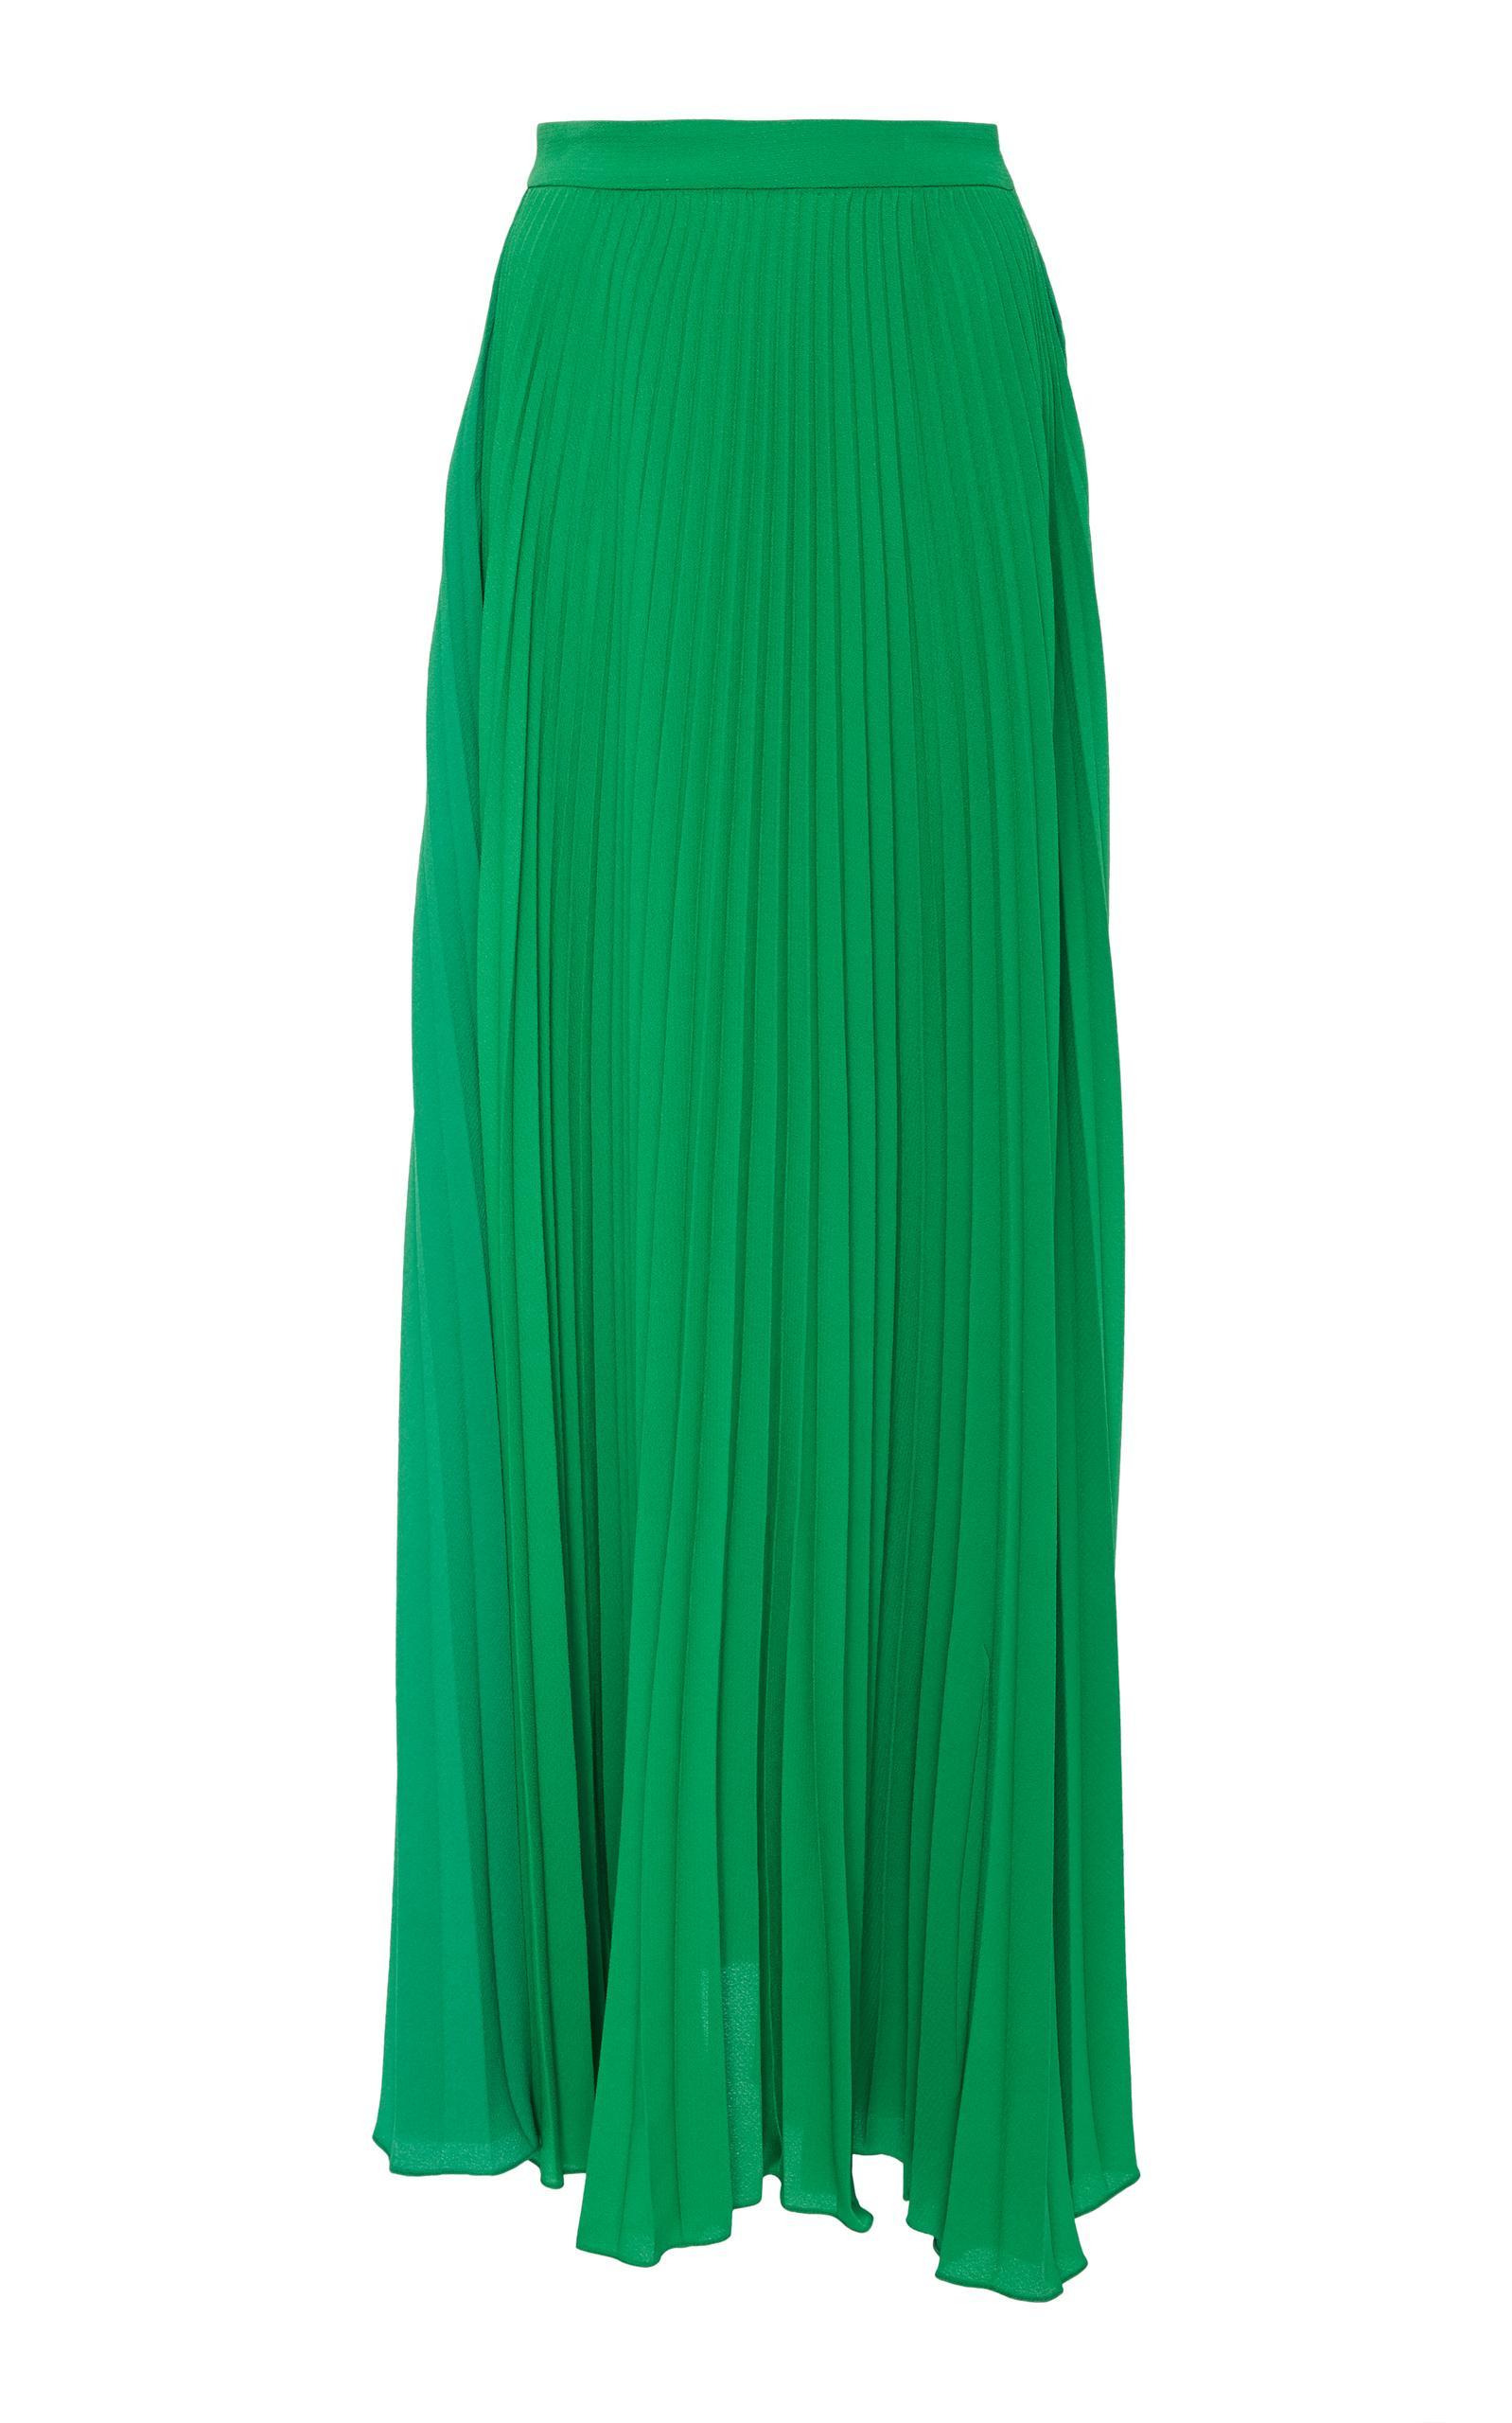 5363cefd1 Adriana Degreas Le Fleur High Waist Pleated Long Skirt In Green ...